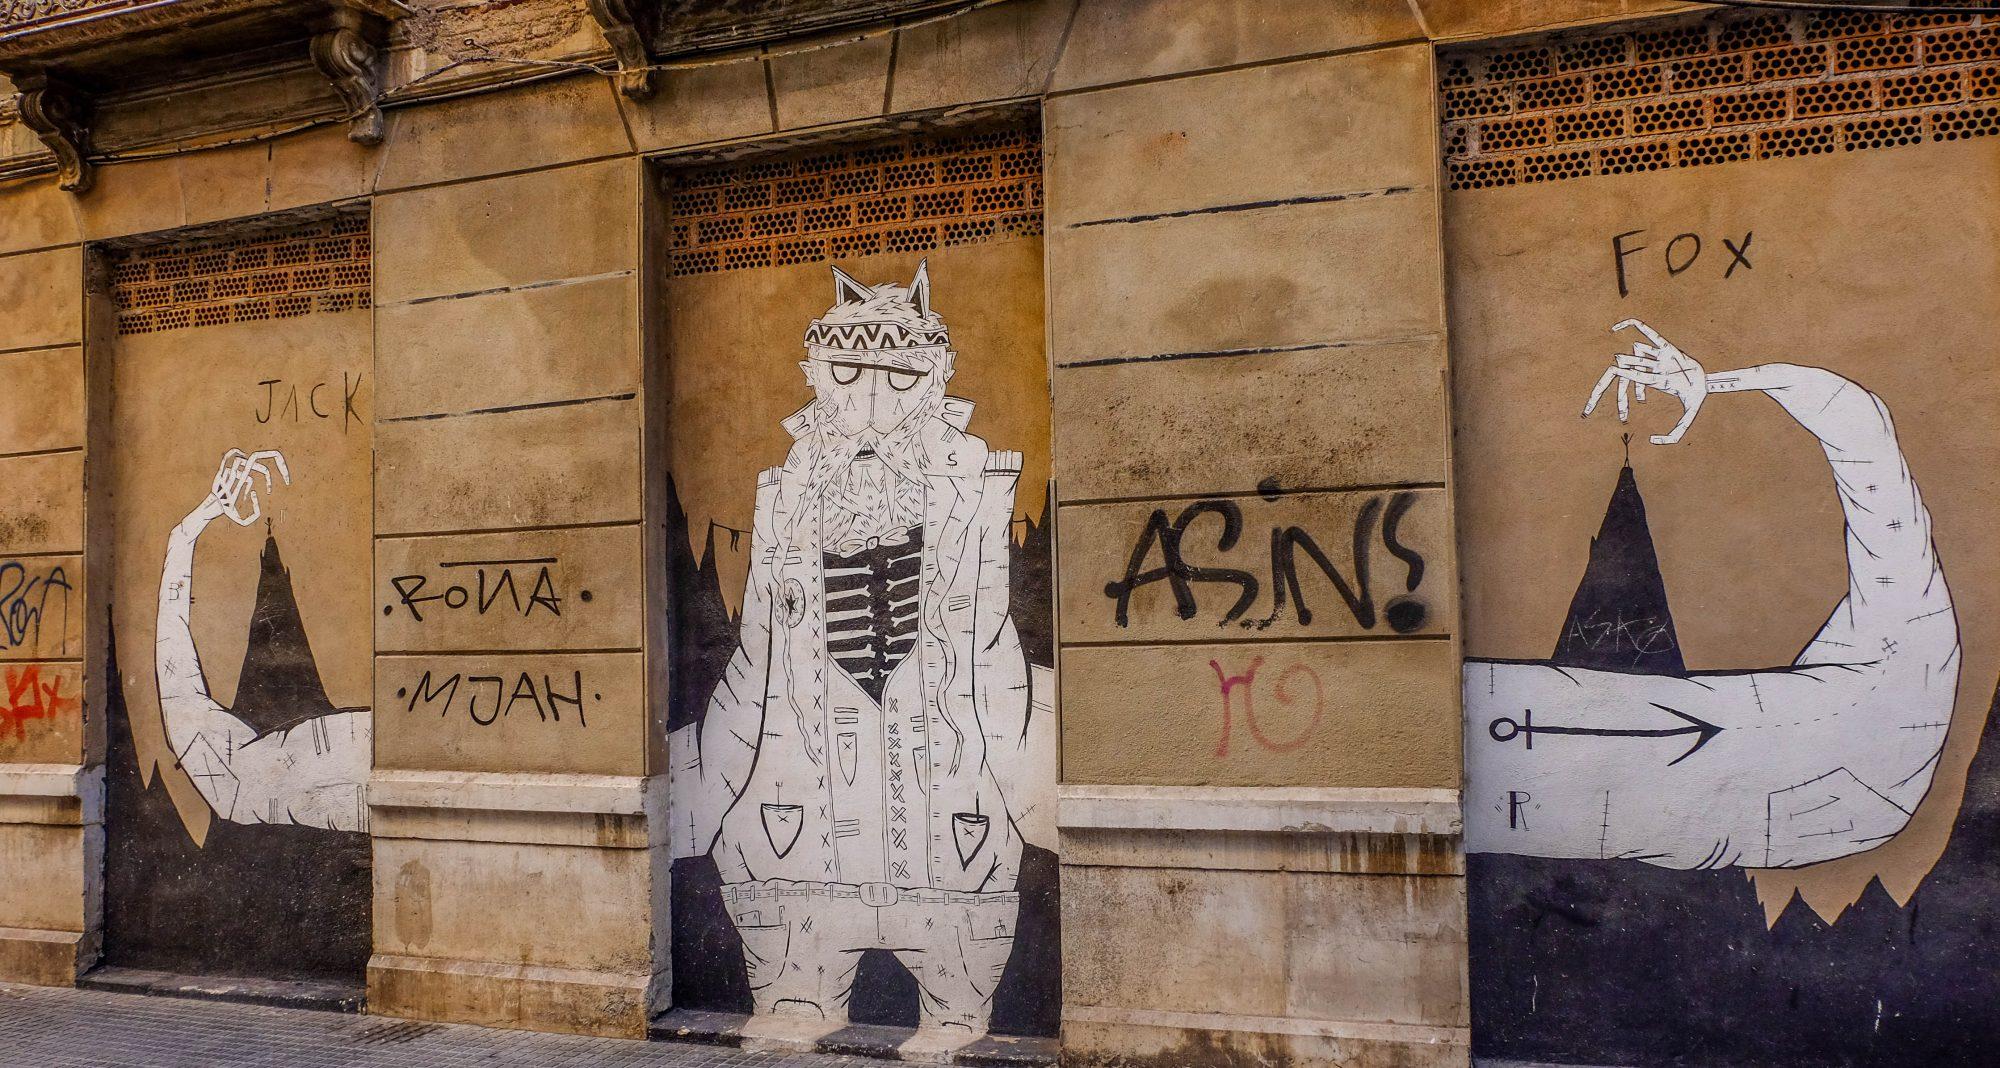 Triptyque sur mur, Street Art - Malaga, Espagne